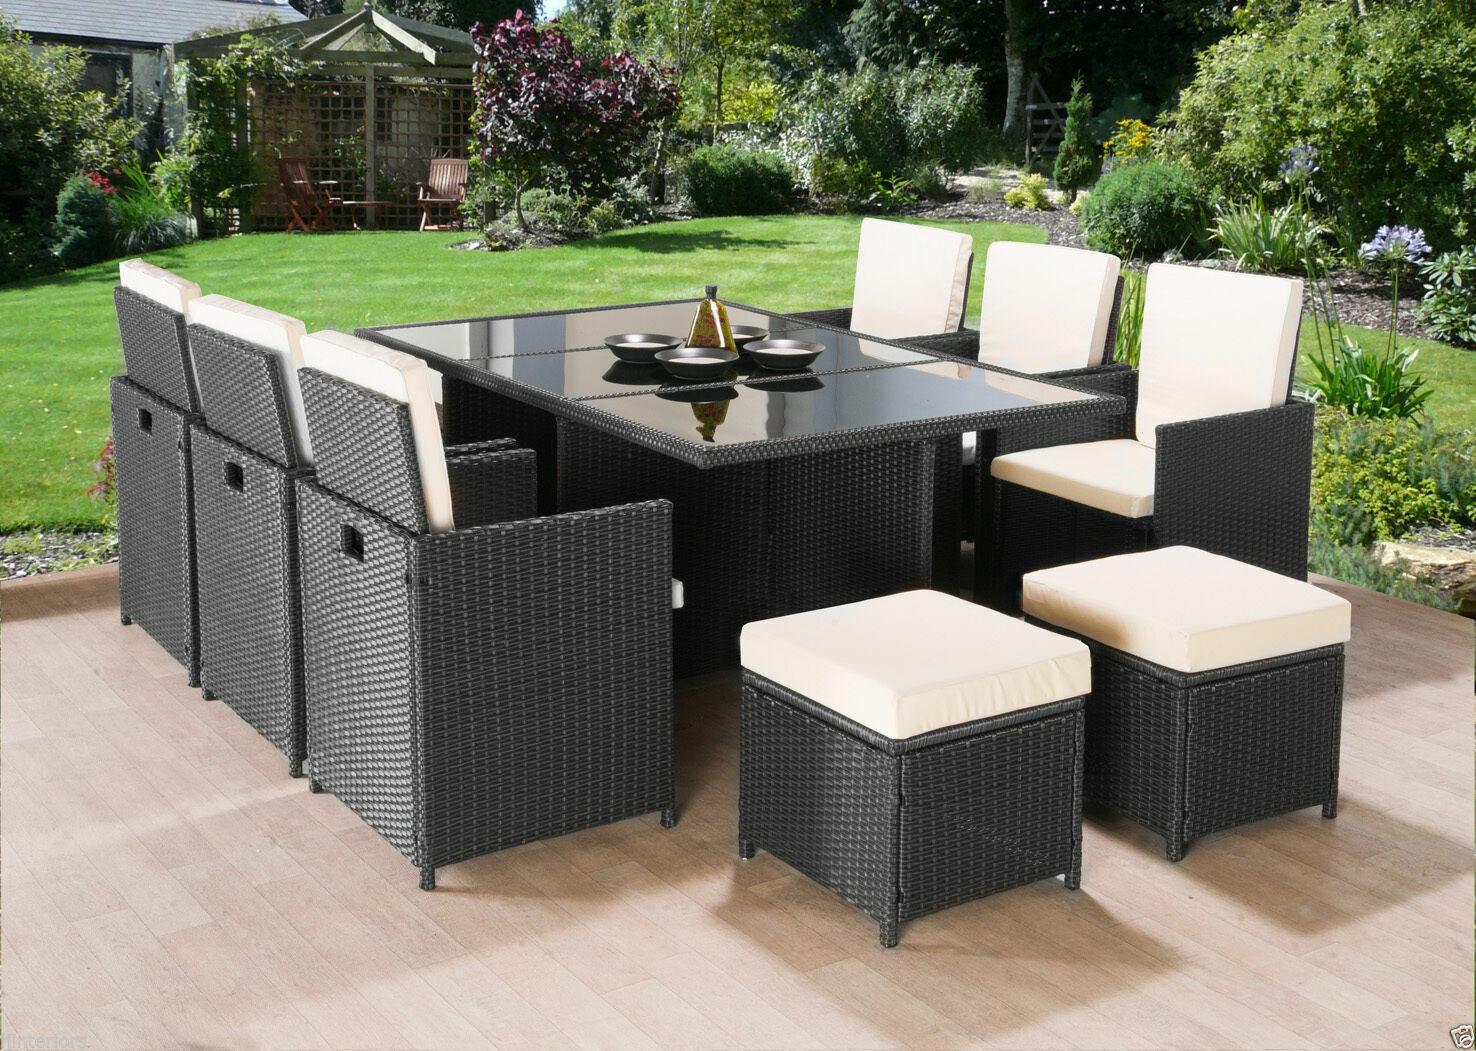 Garden Furniture - CUBE 2019 RATTAN GARDEN FURNITURE SET CHAIRS TABLE OUTDOOR PATIO WICKER 10 SEATS